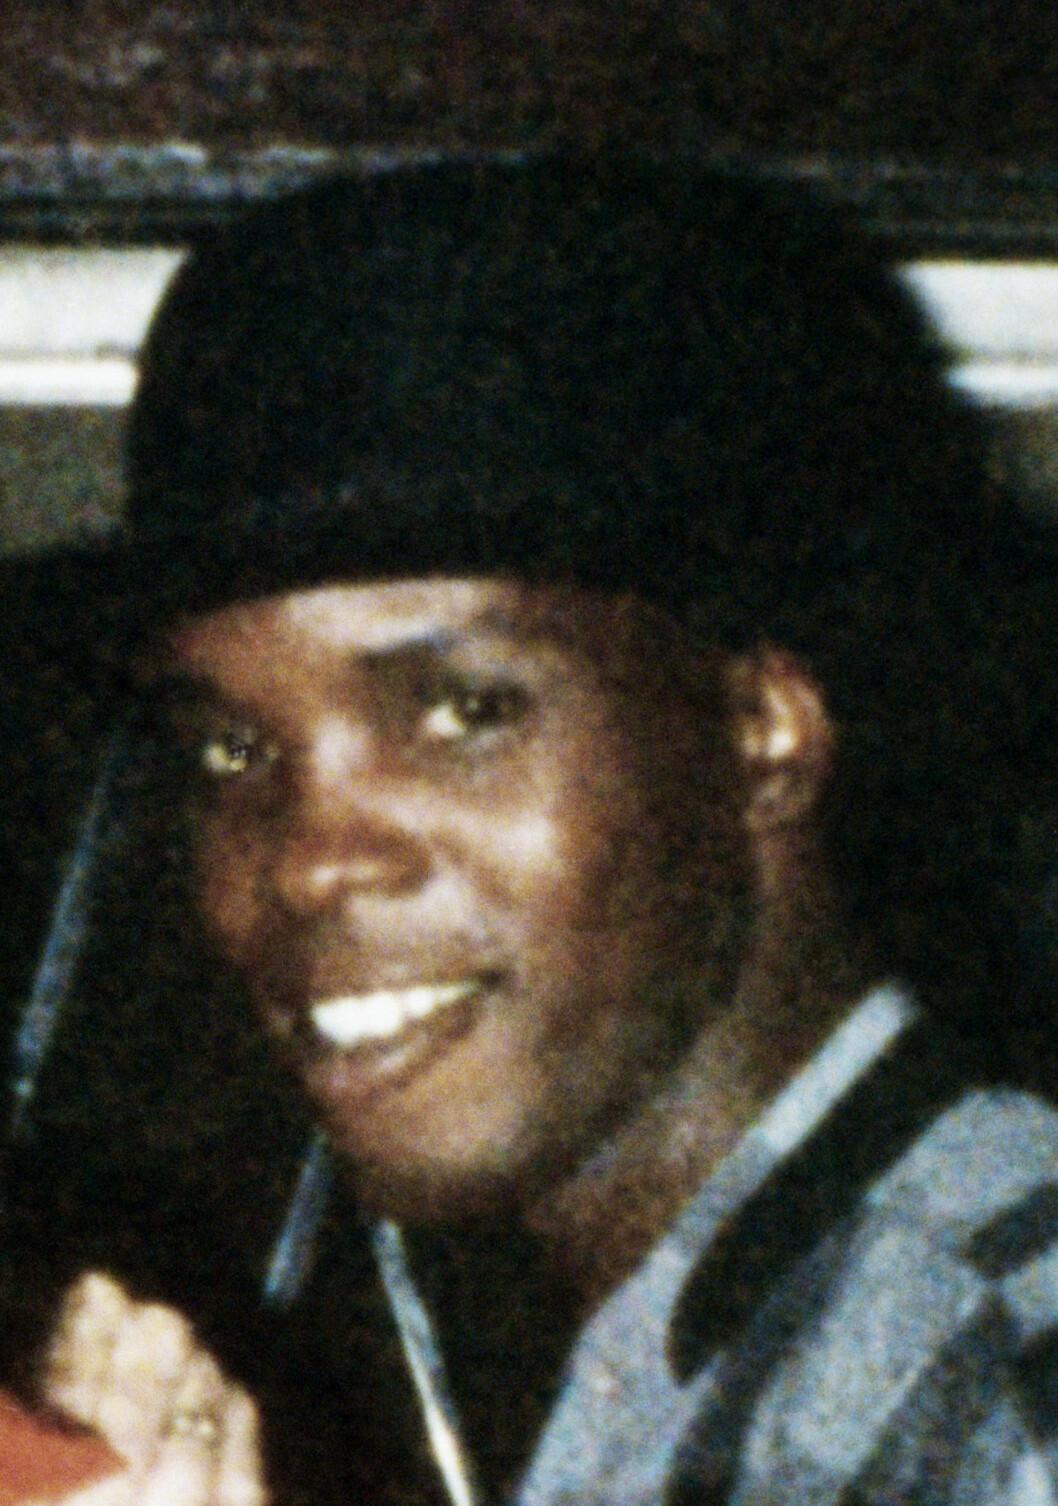 DREPT:  Edward W. Smith ble drept 14. juni 1990. Han ble bare 27 år gammel. Foto: NTB Scanpix